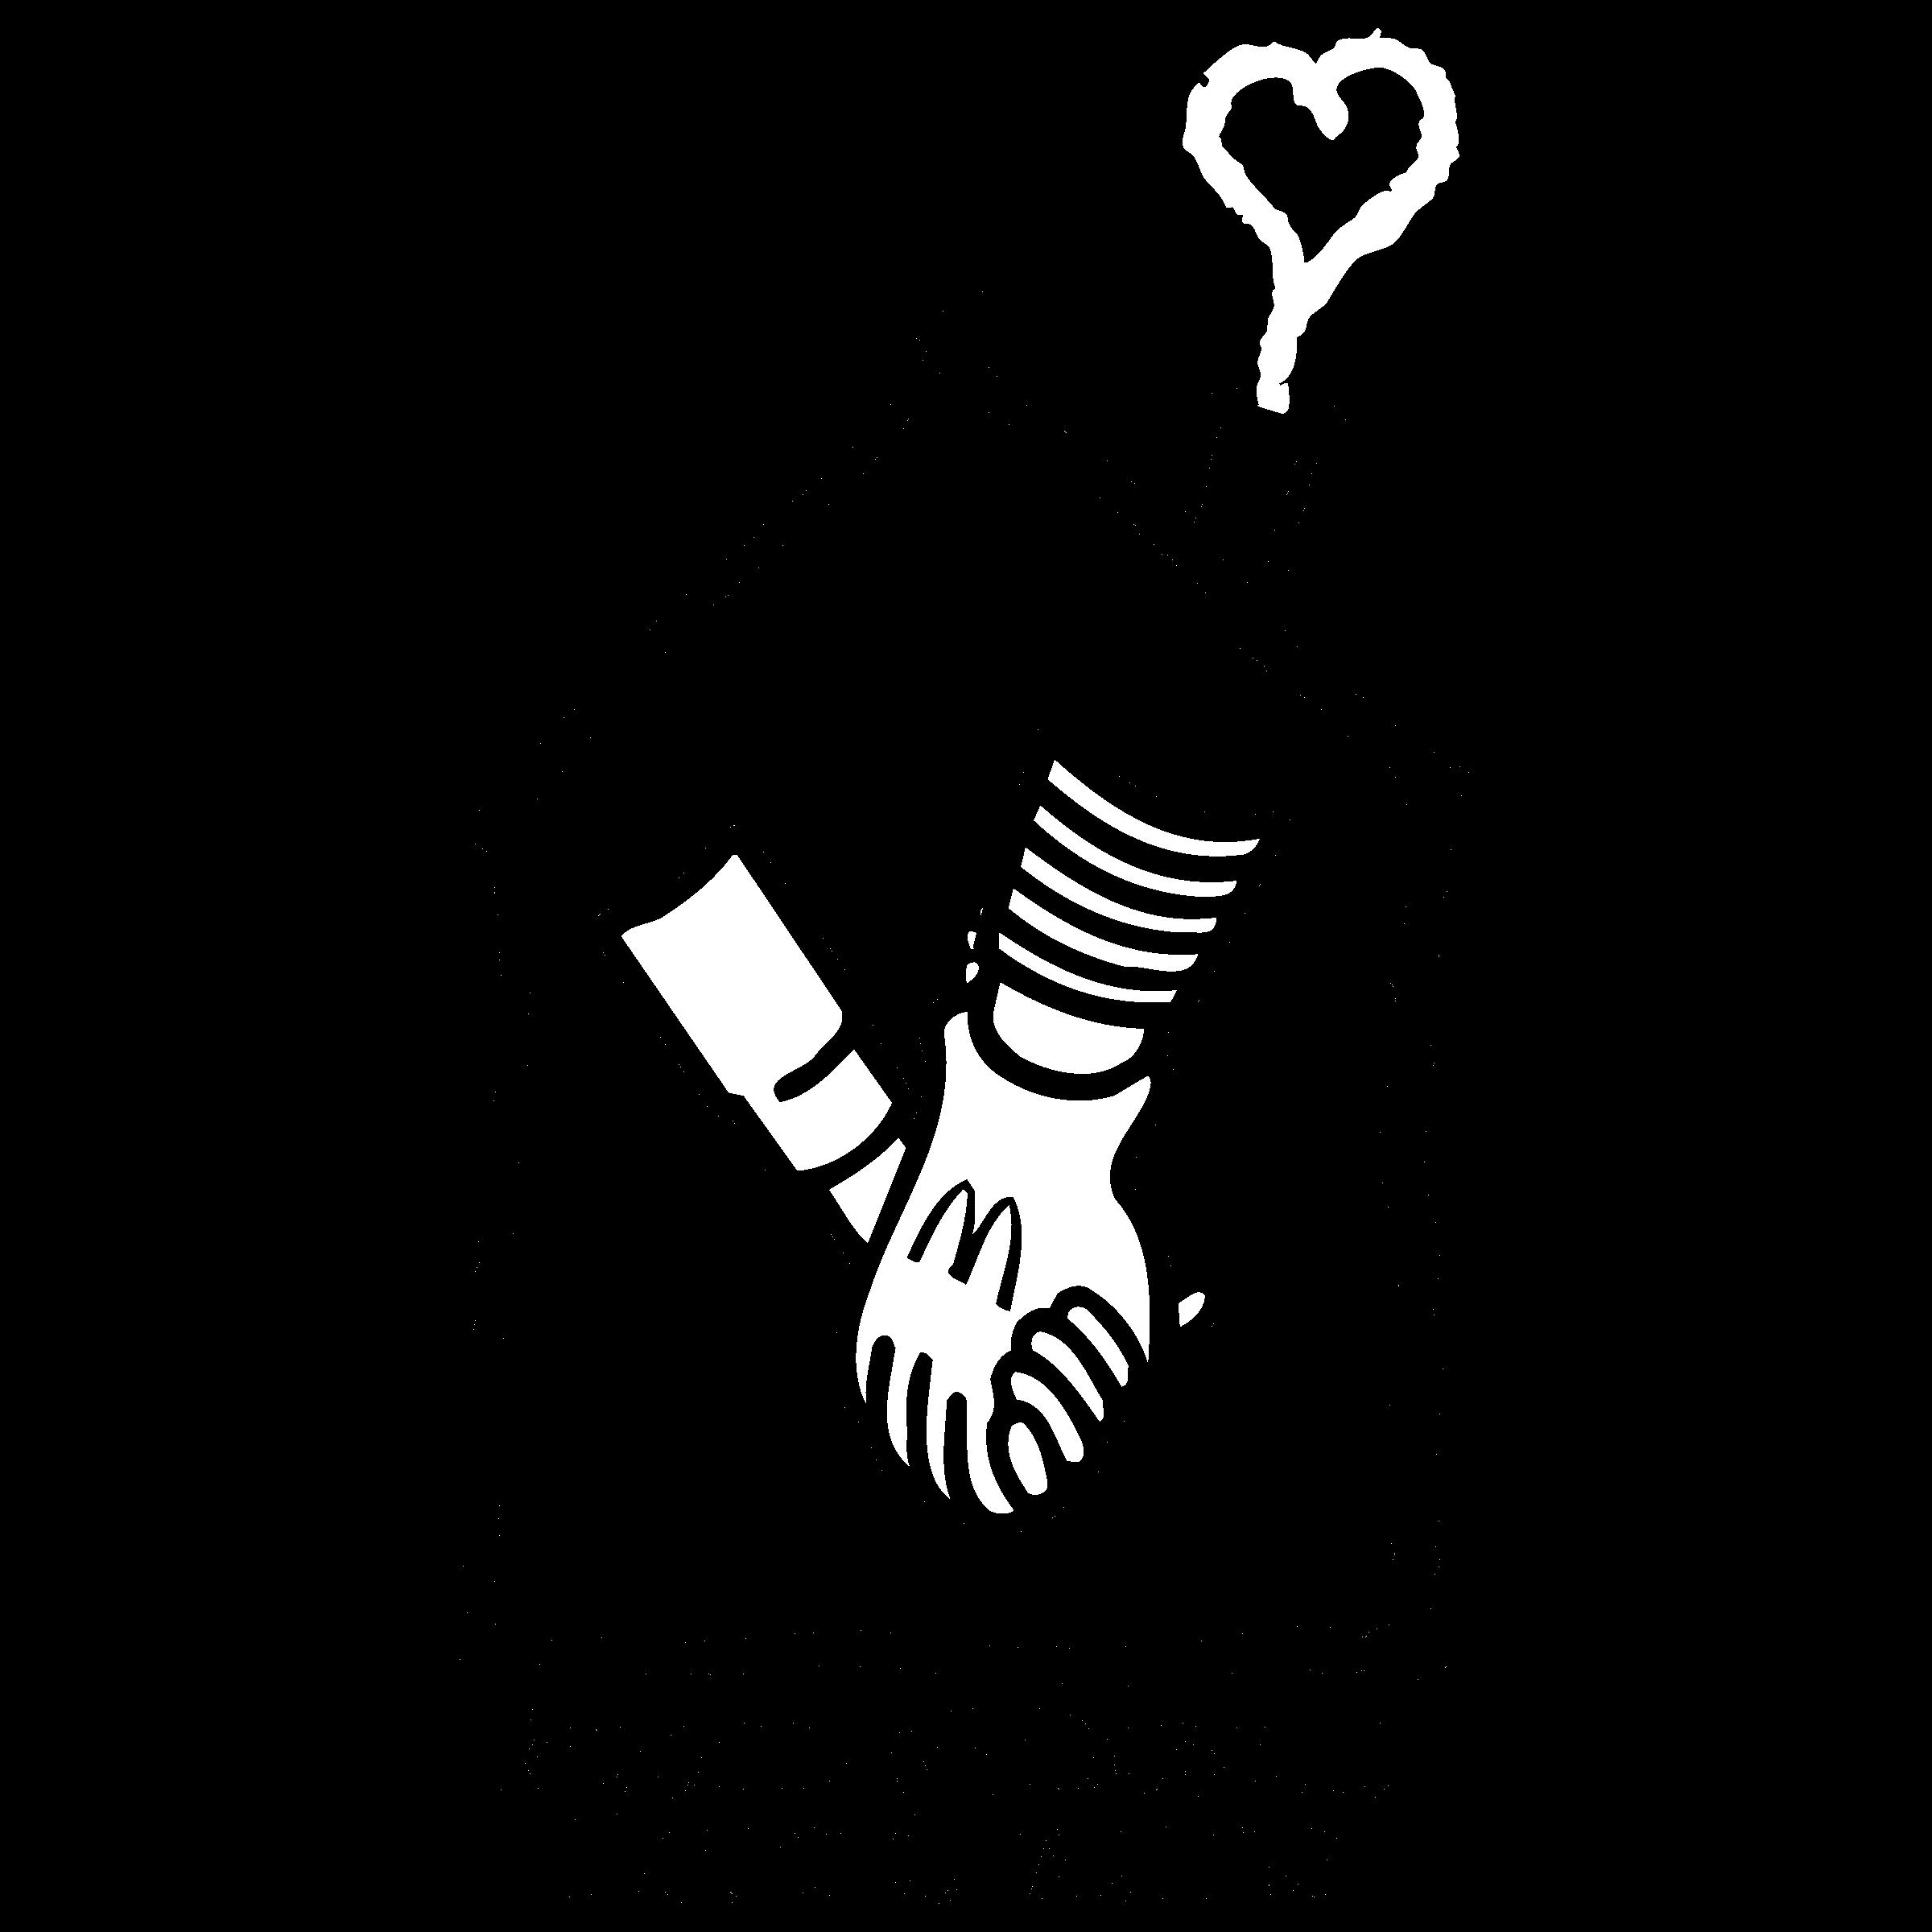 ronald-mcdonald-logo-black-and-white.png